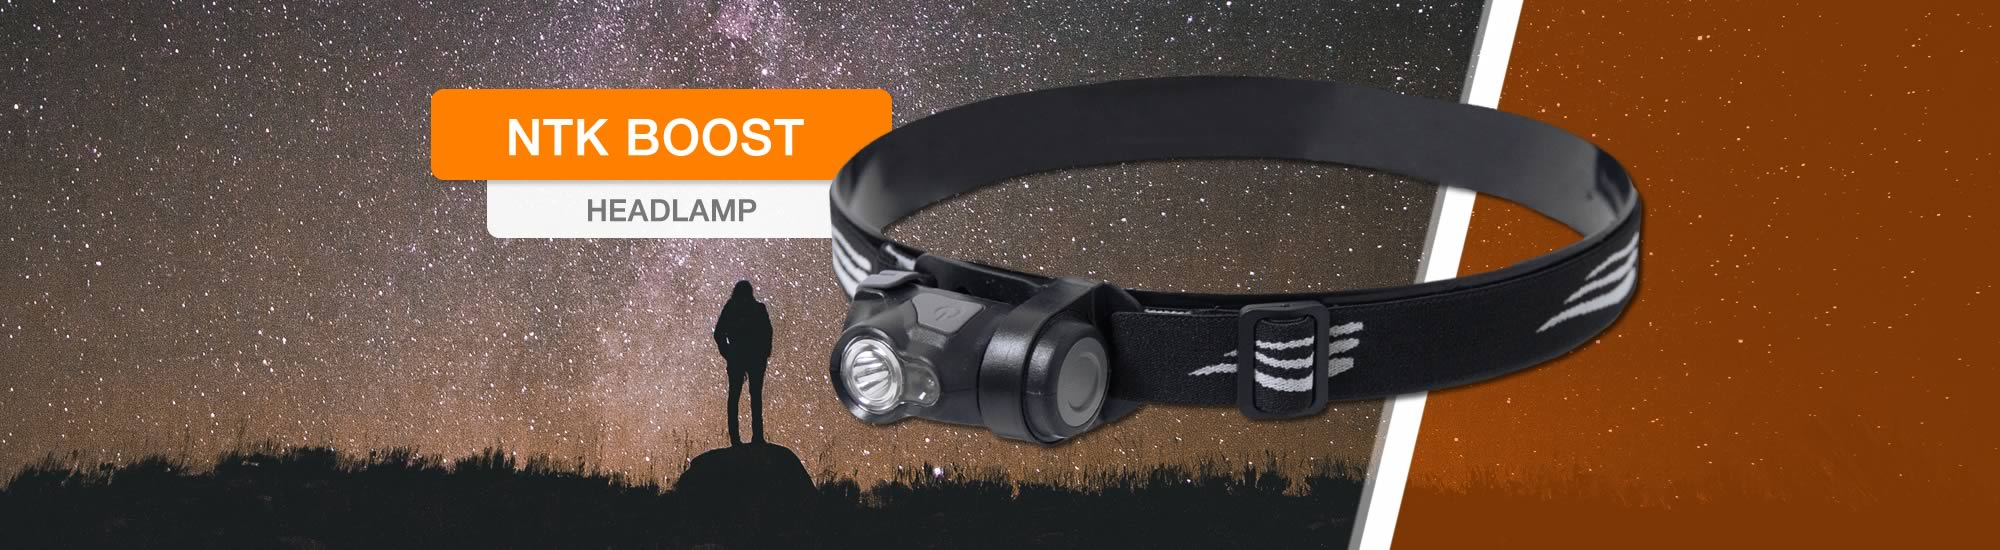 NTK Boost Headlamp